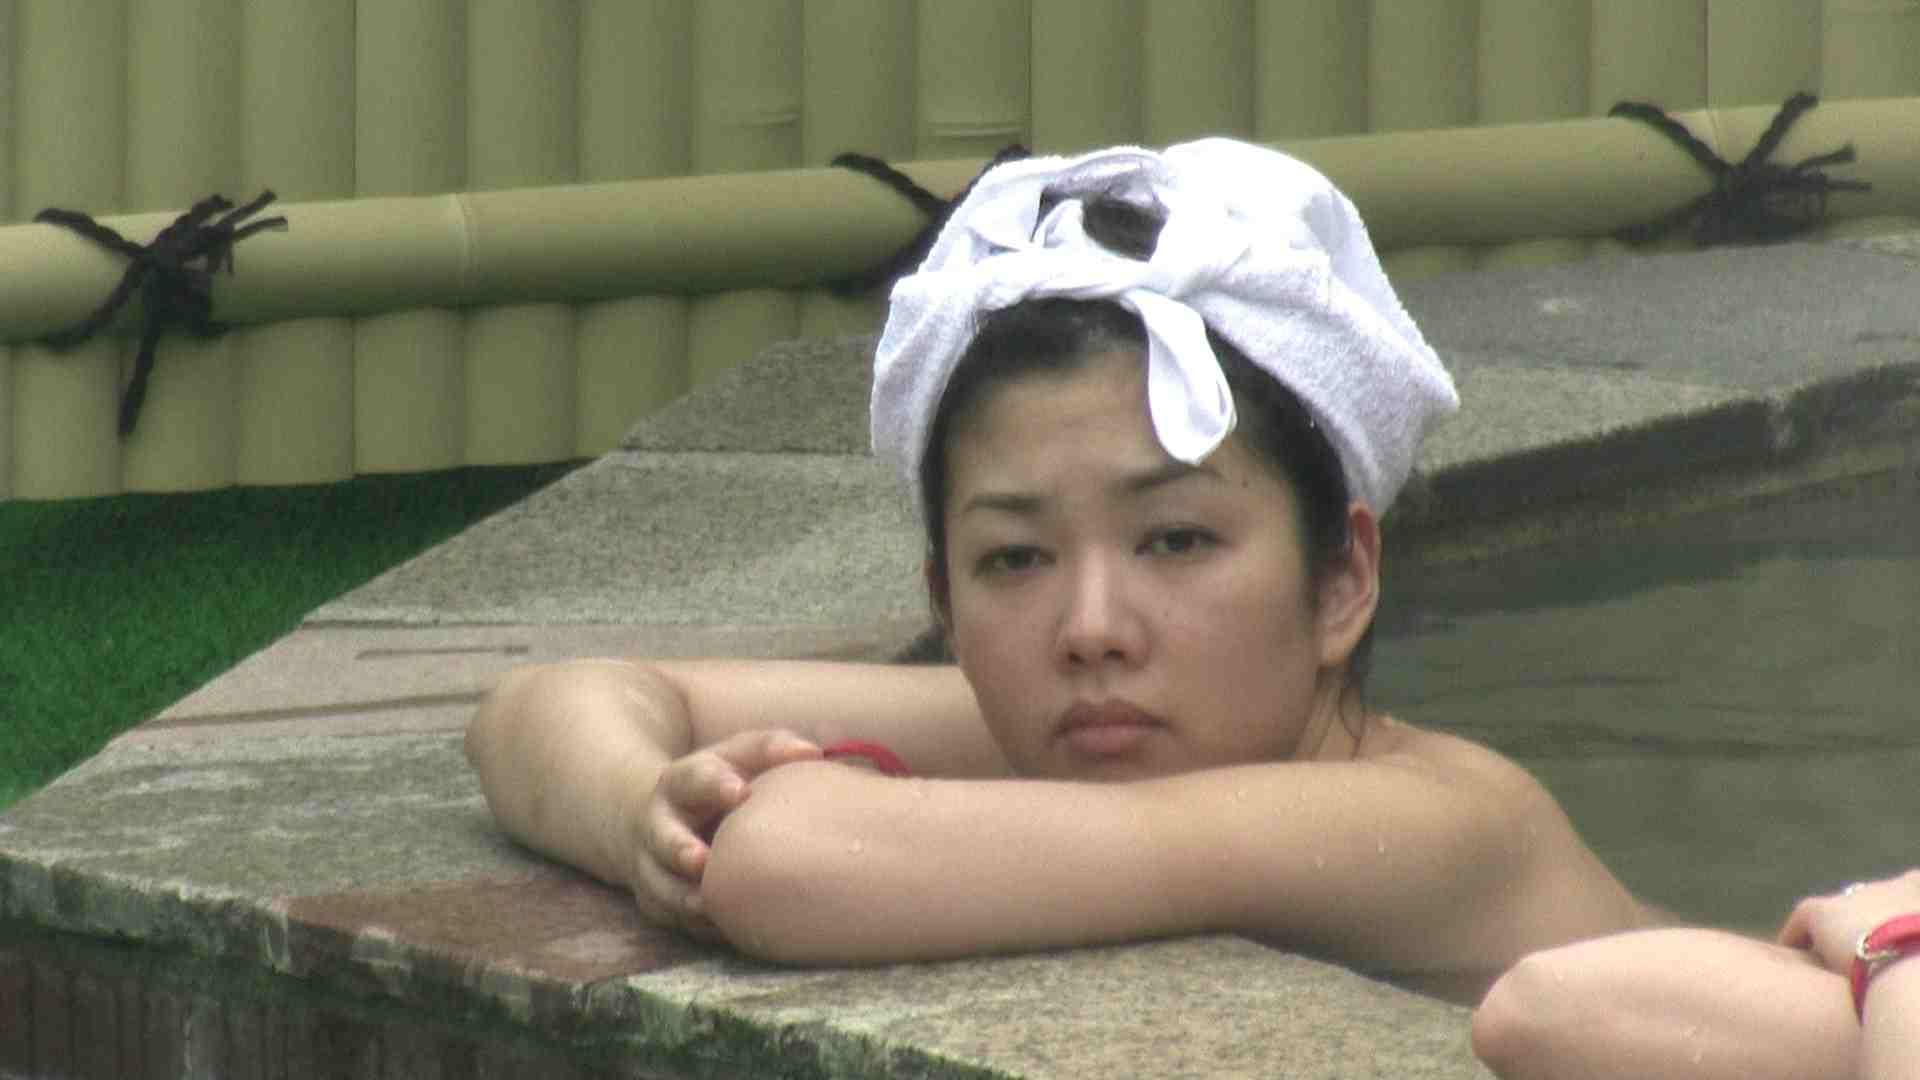 Aquaな露天風呂Vol.192 露天風呂突入 | 盗撮師作品  101pic 34